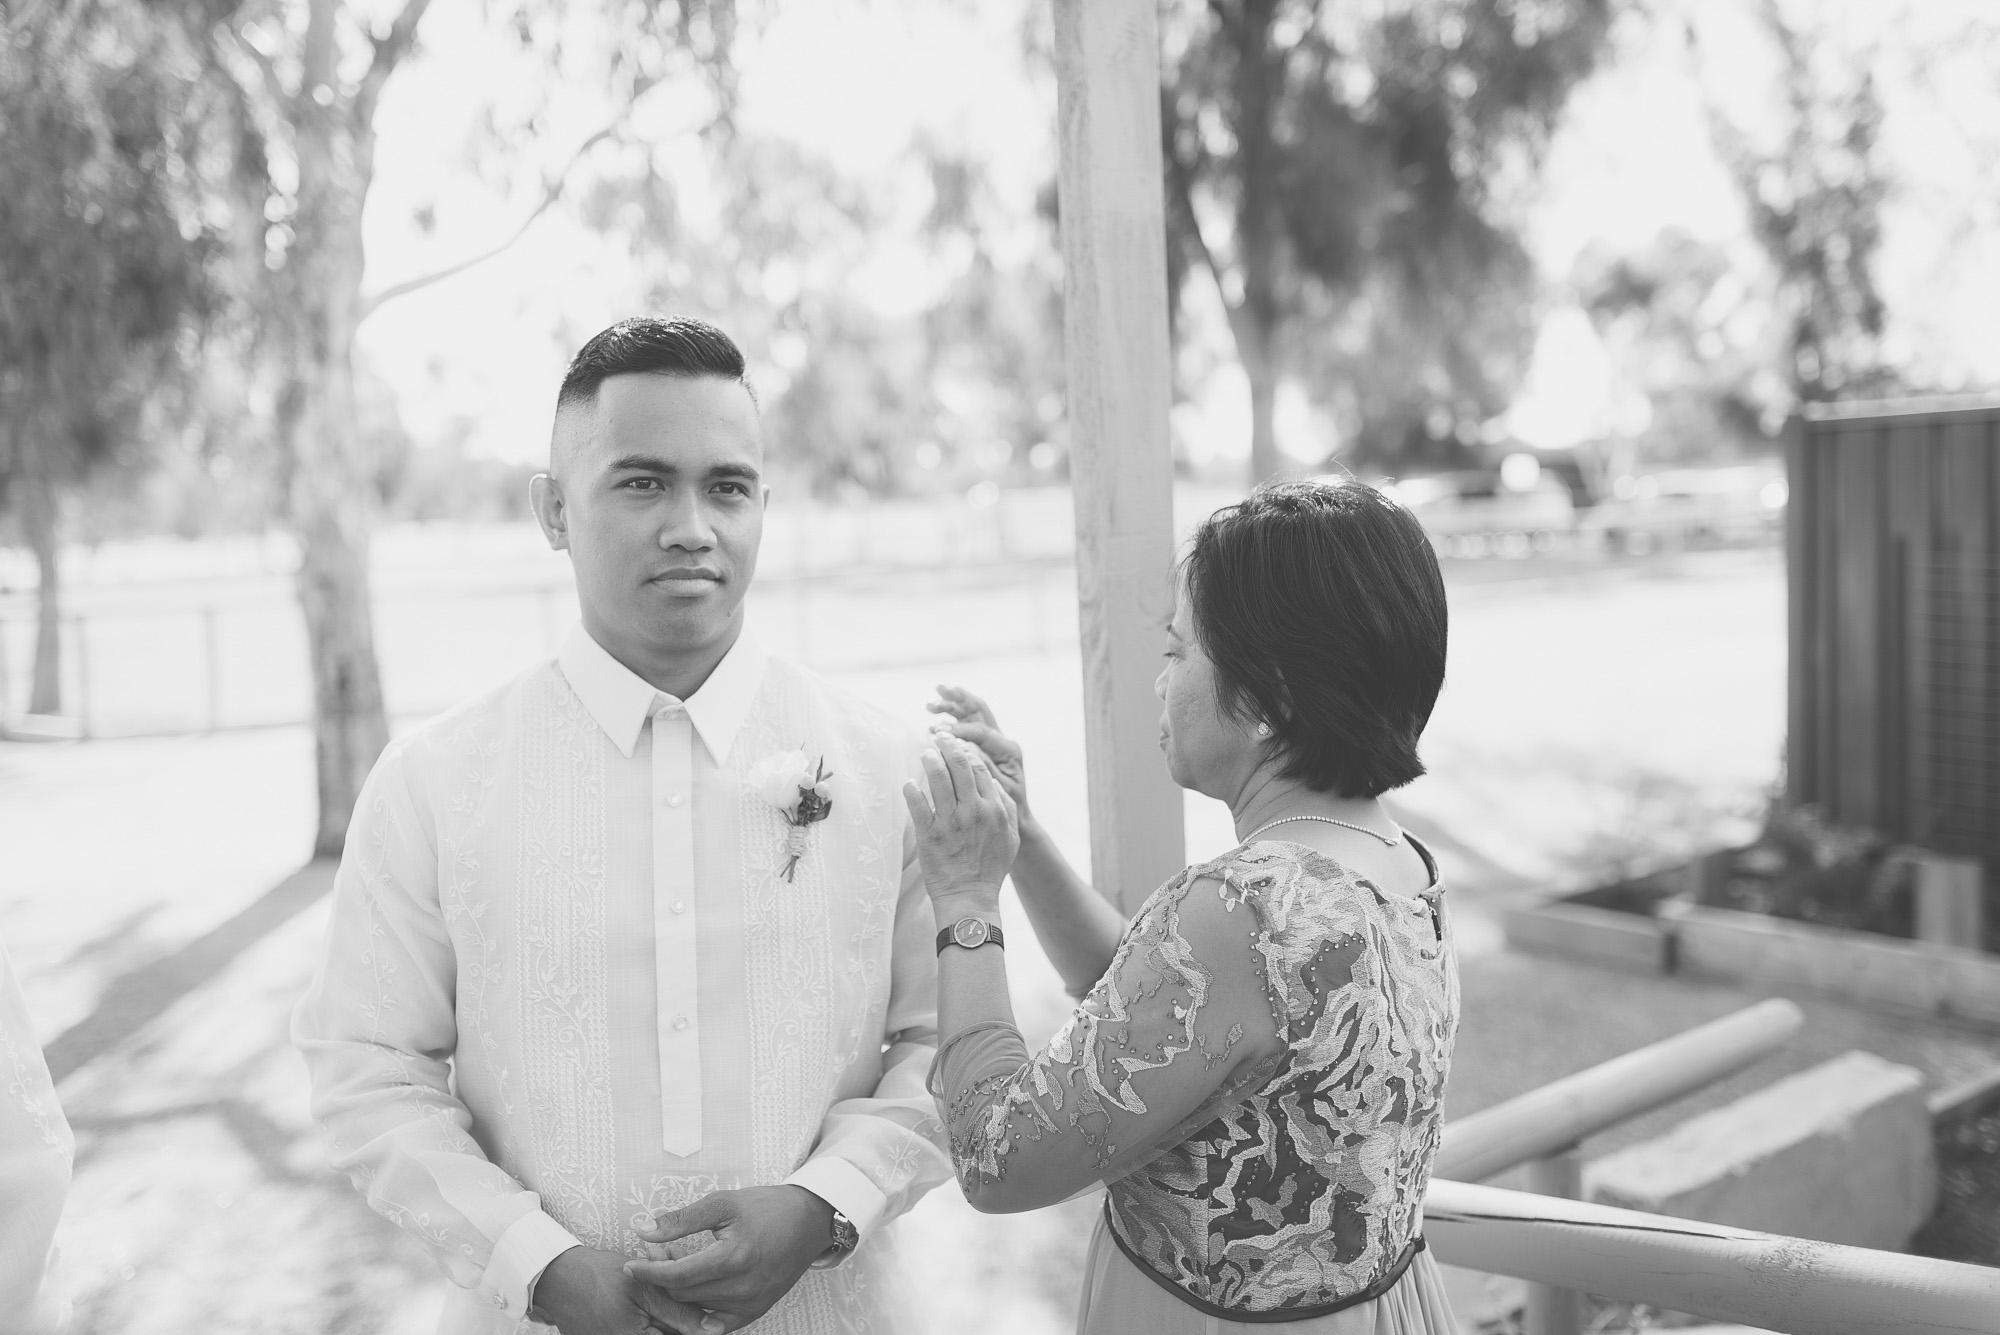 wedding-photographer-outdoor-casual-styled-los-angeles-australia-california-international-earthbound -23.jpg